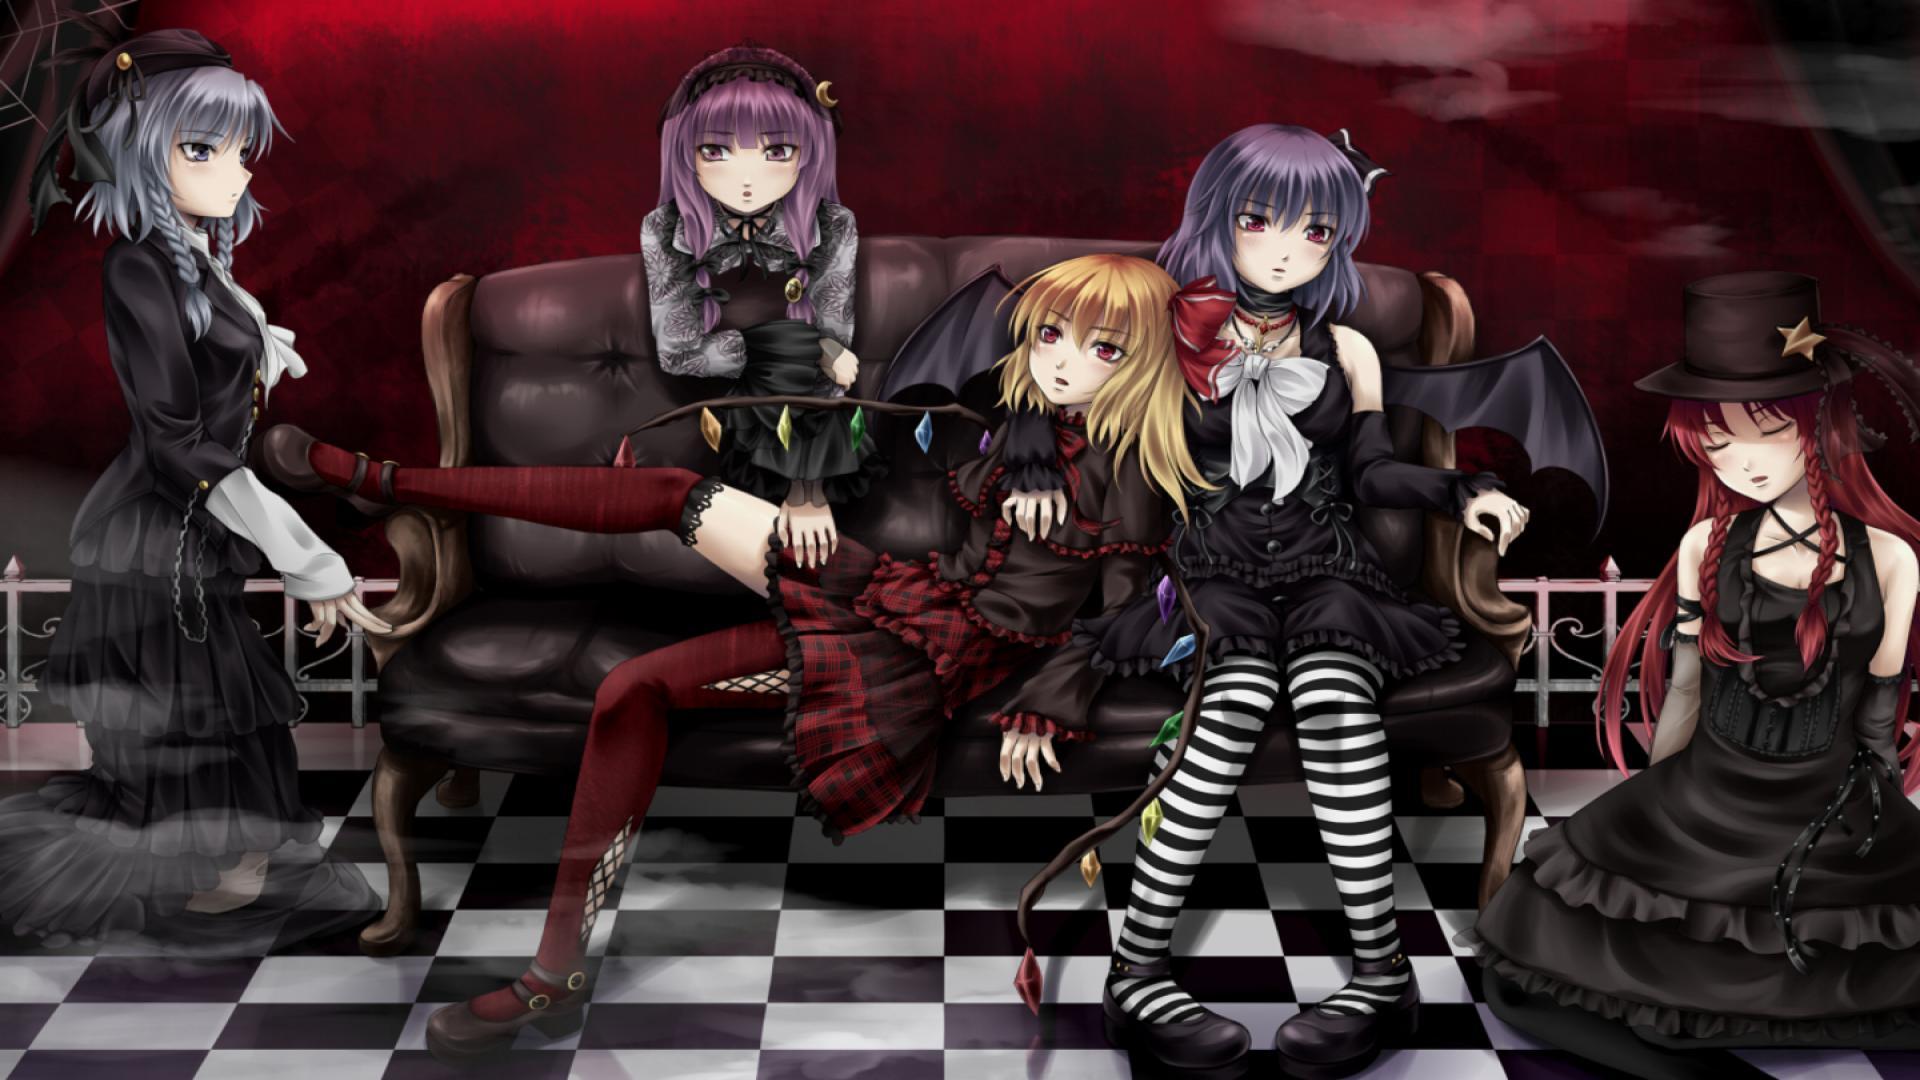 Cute Gothic Anime Girl - HD Wallpaper